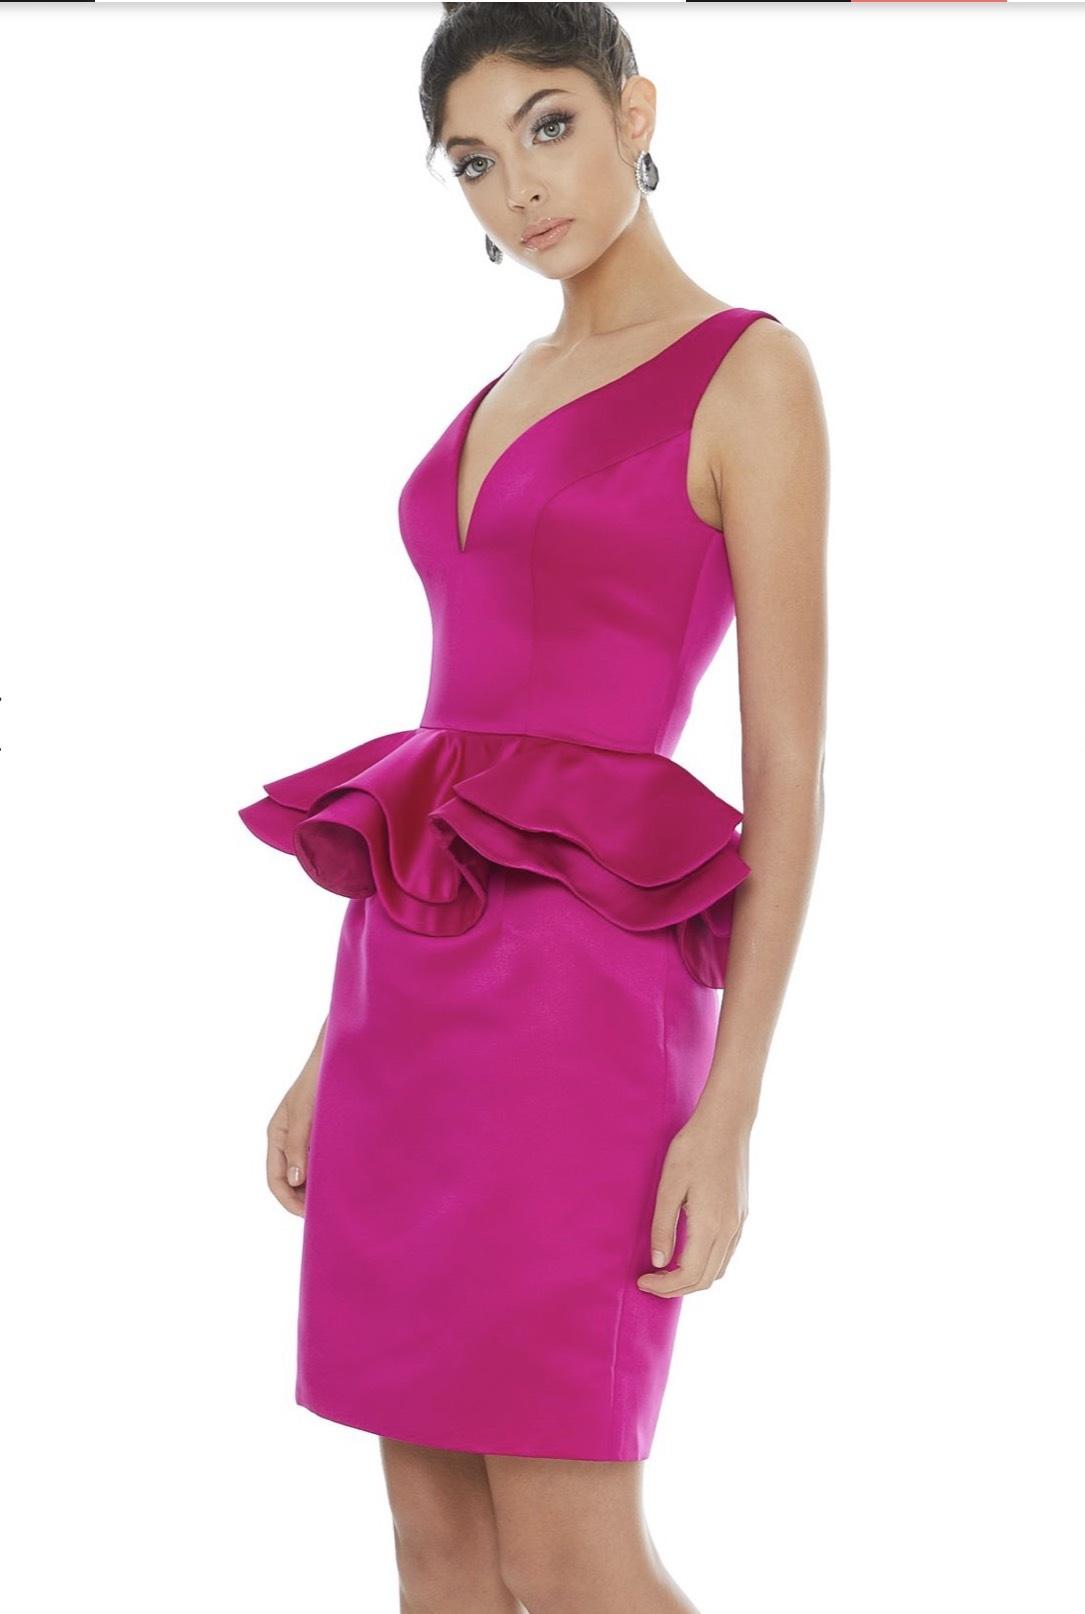 Ashley Lauren Hot Pink Size 8 Plunge Interview Cocktail Dress on Queenly